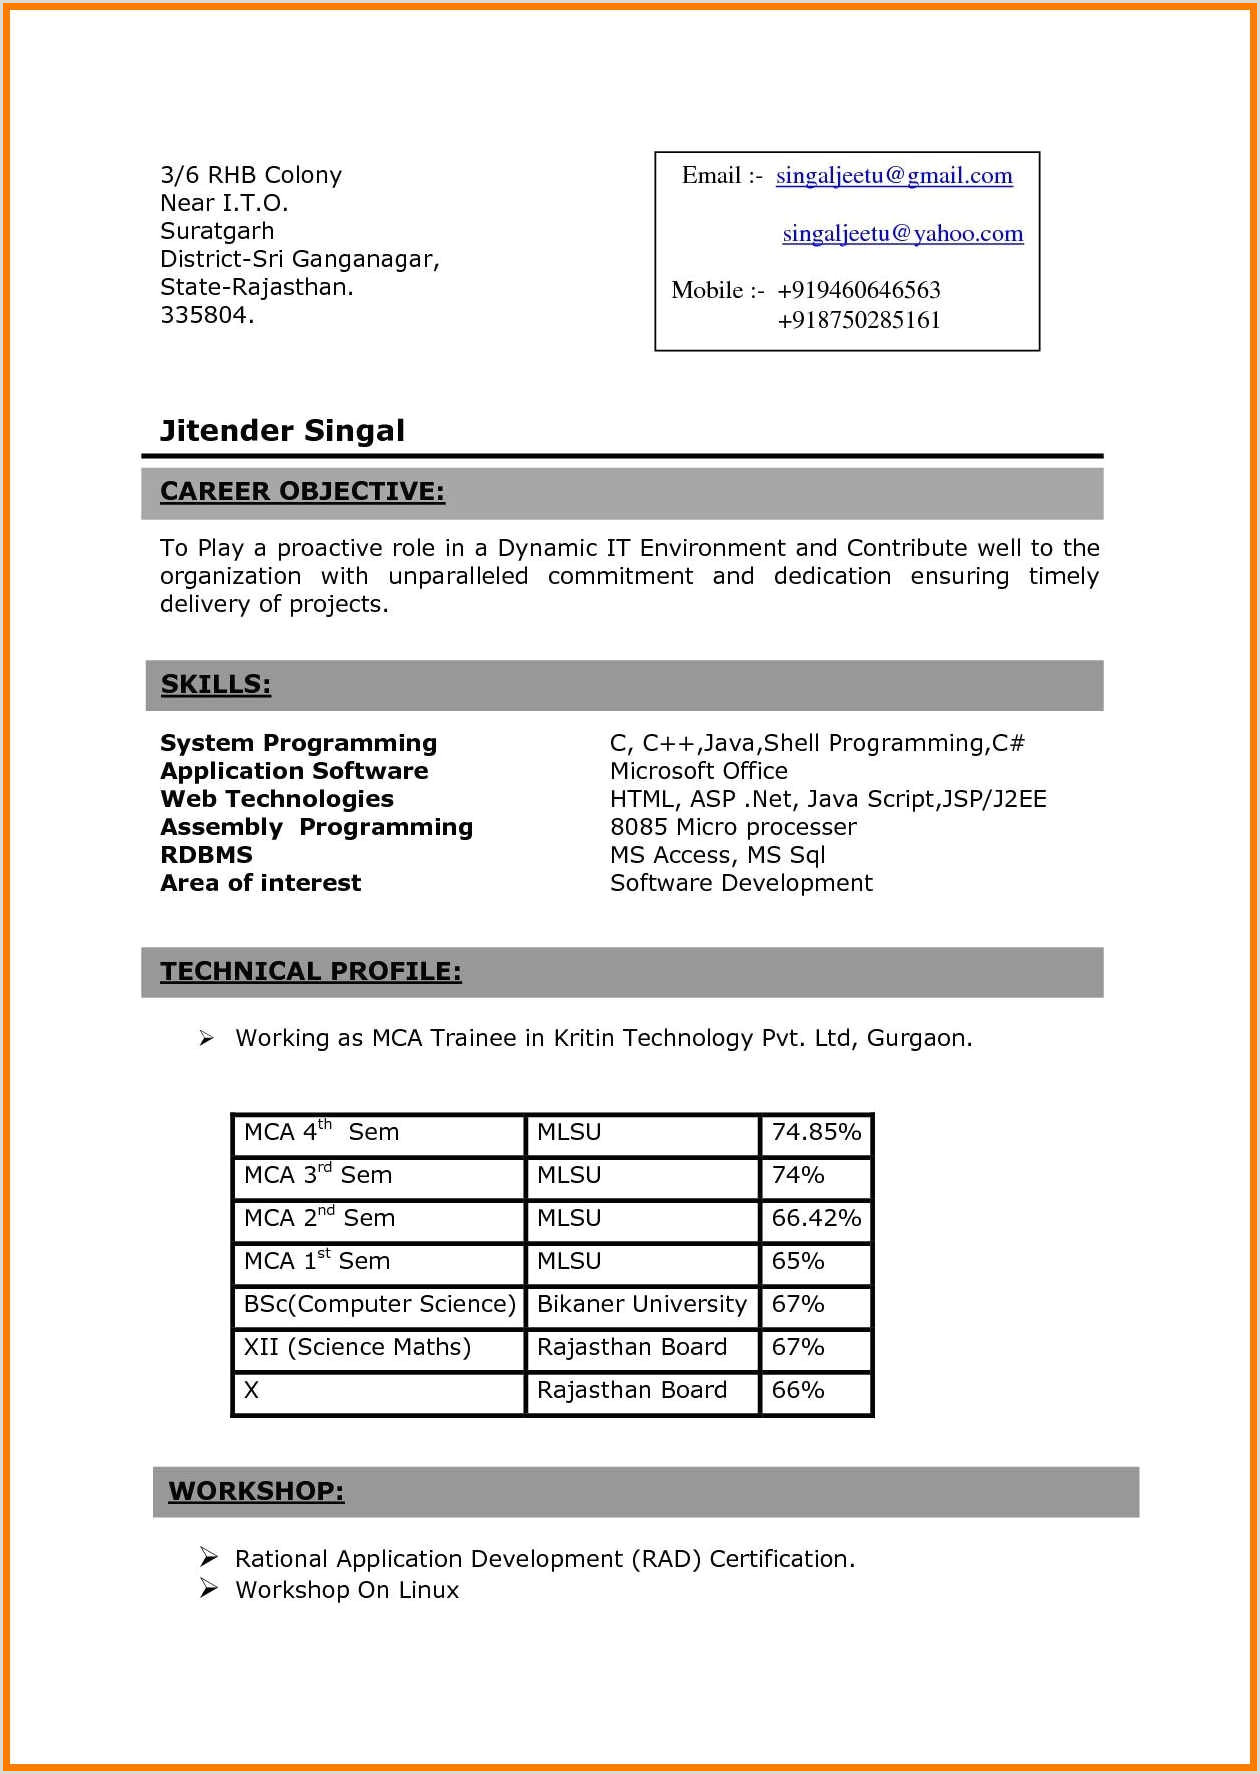 Fresher Resume format B.com Sample Resume format Mca Freshers New 12 13 Fresher Resume